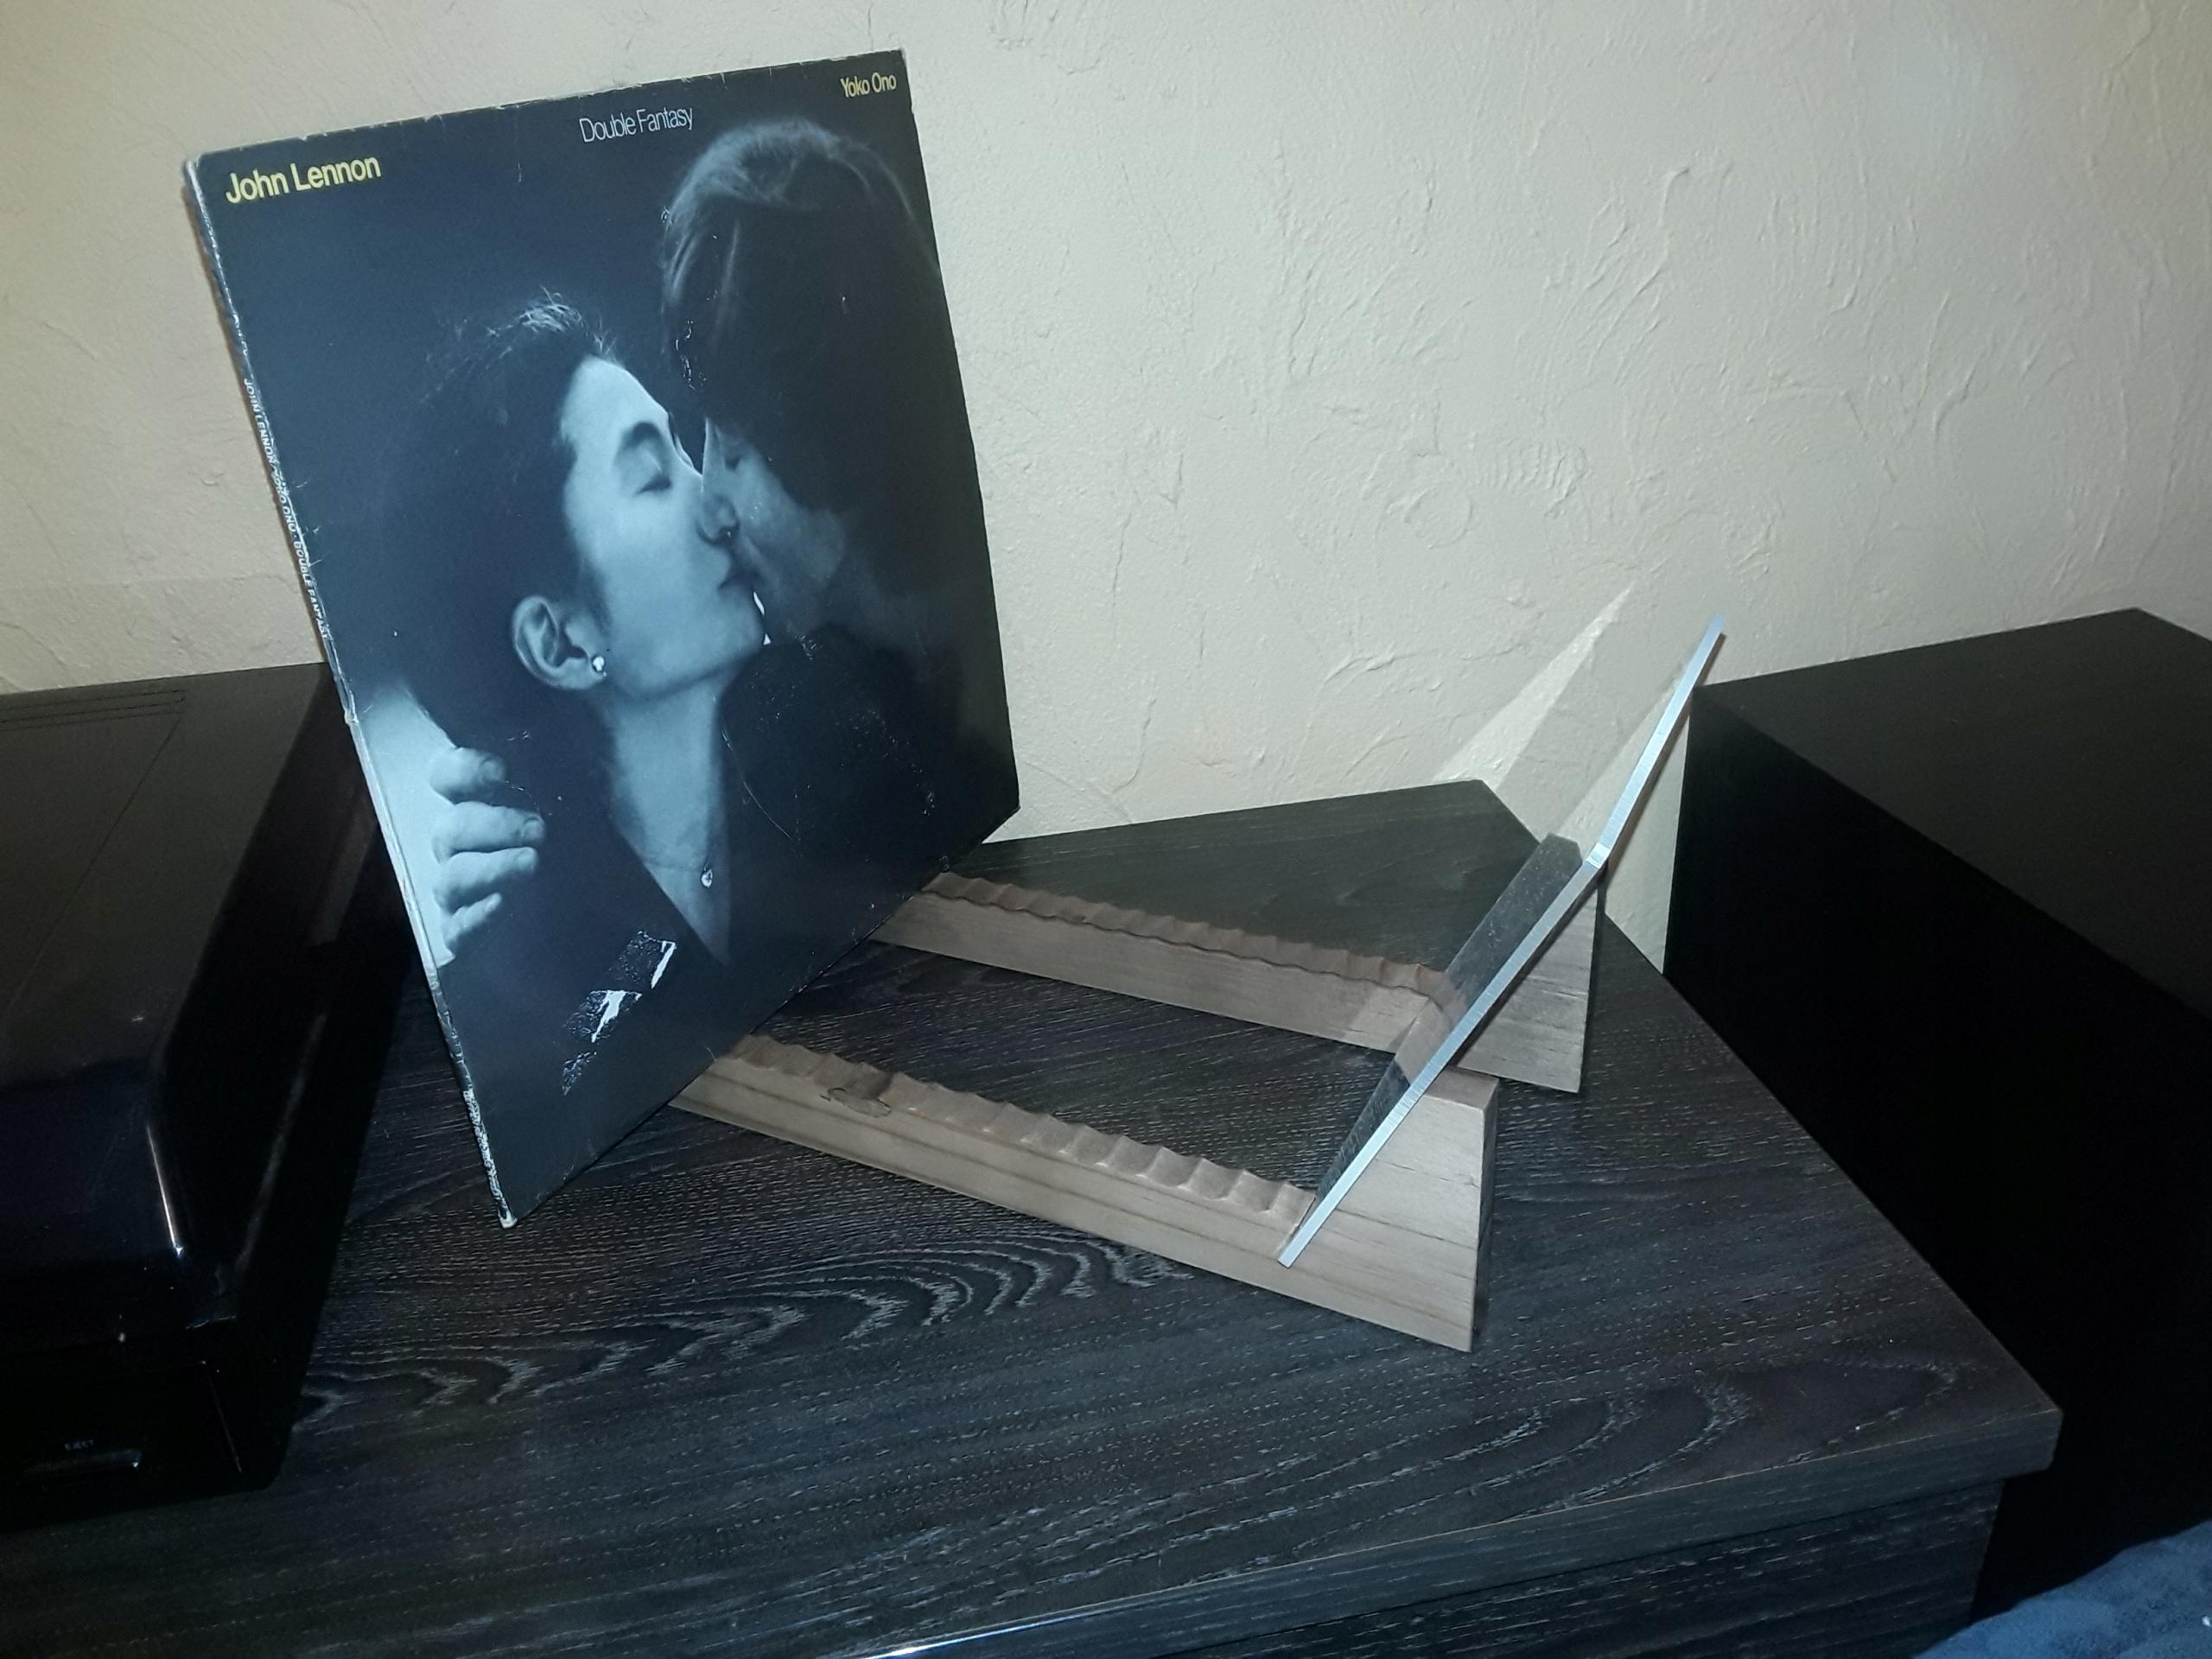 Item Stand,box,vinyl records, vinyls 50 discs,c